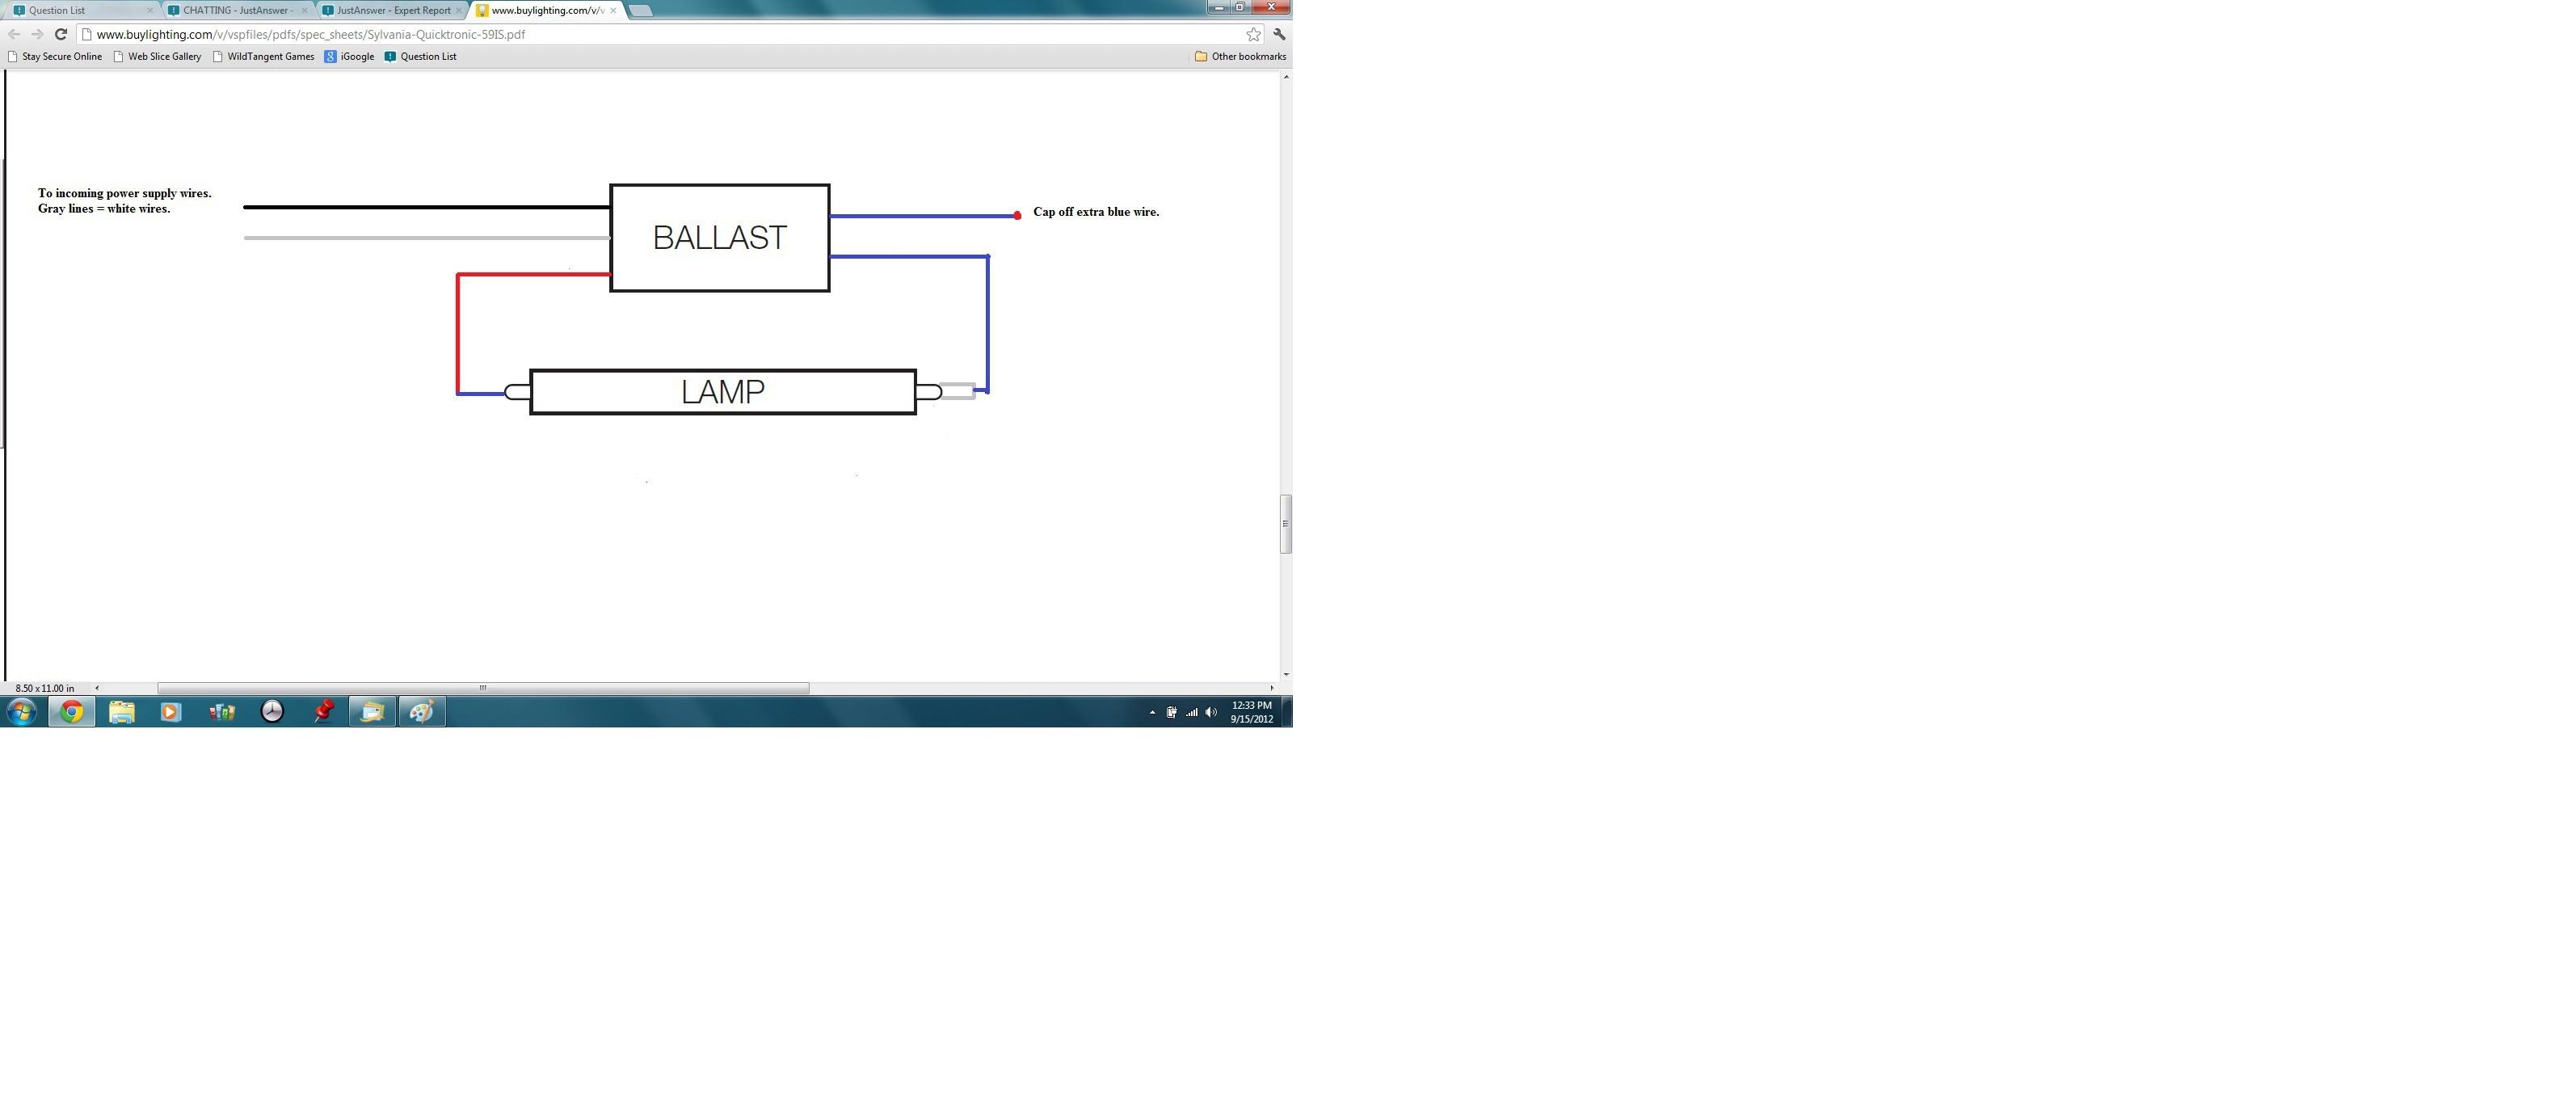 Sylvania Ballast Wiring Diagram Schematic Diagrams T12 Quicktronic Best Of Ge Proline T8